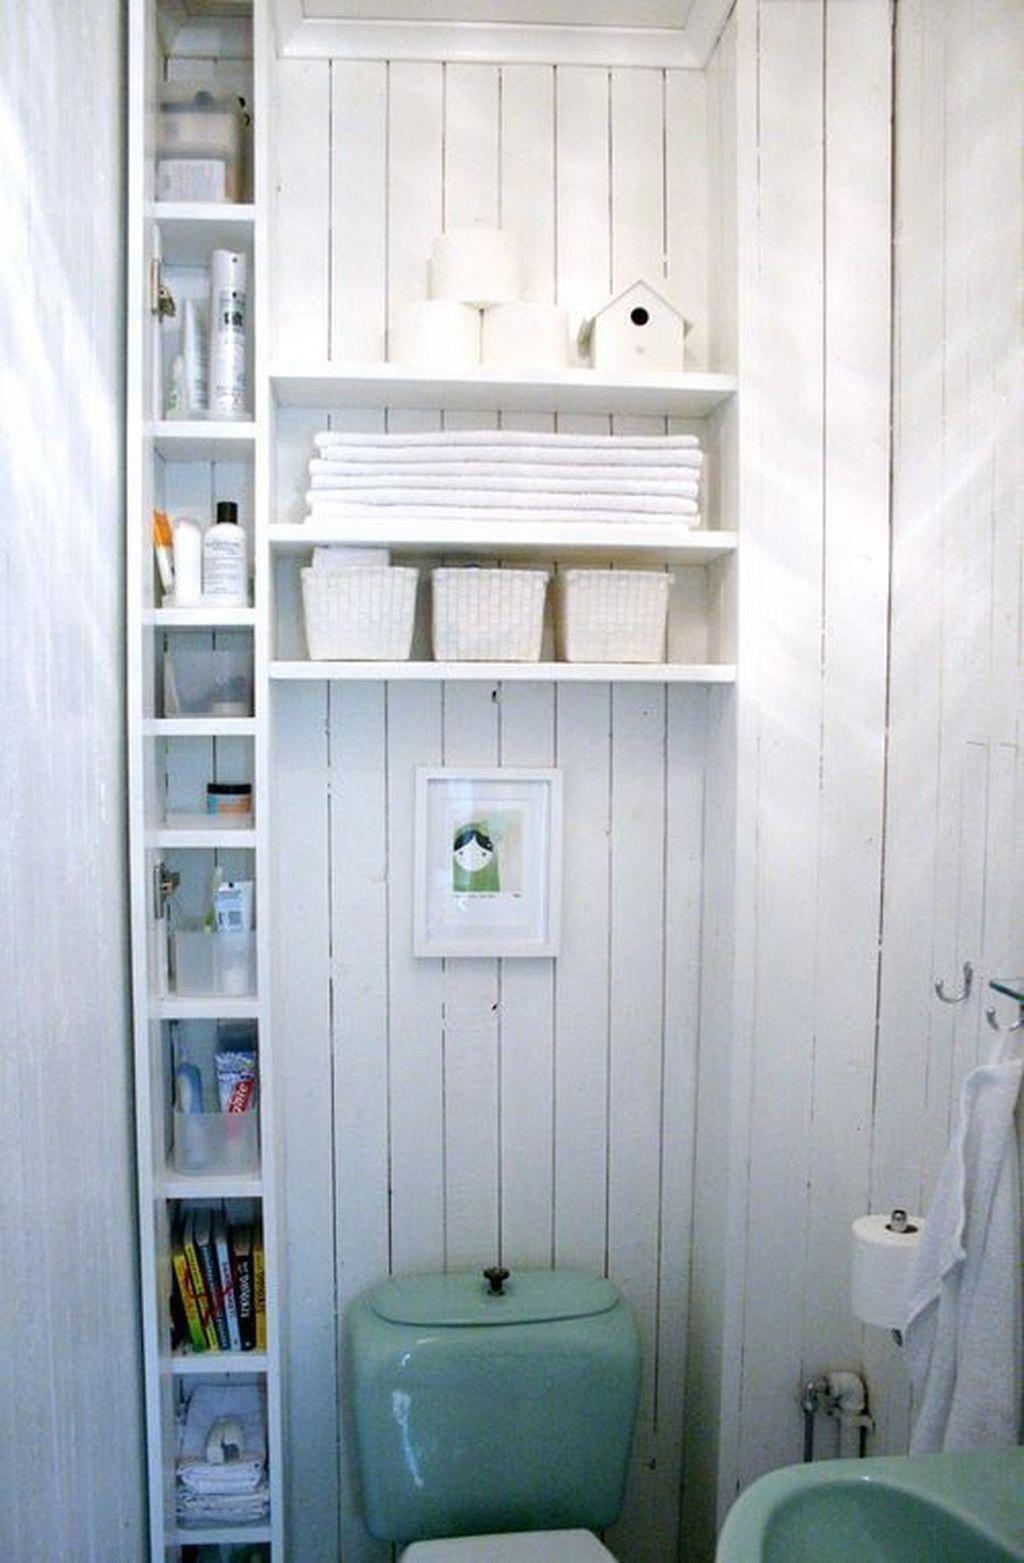 Bathroomstorage small bathroom storage bathroom